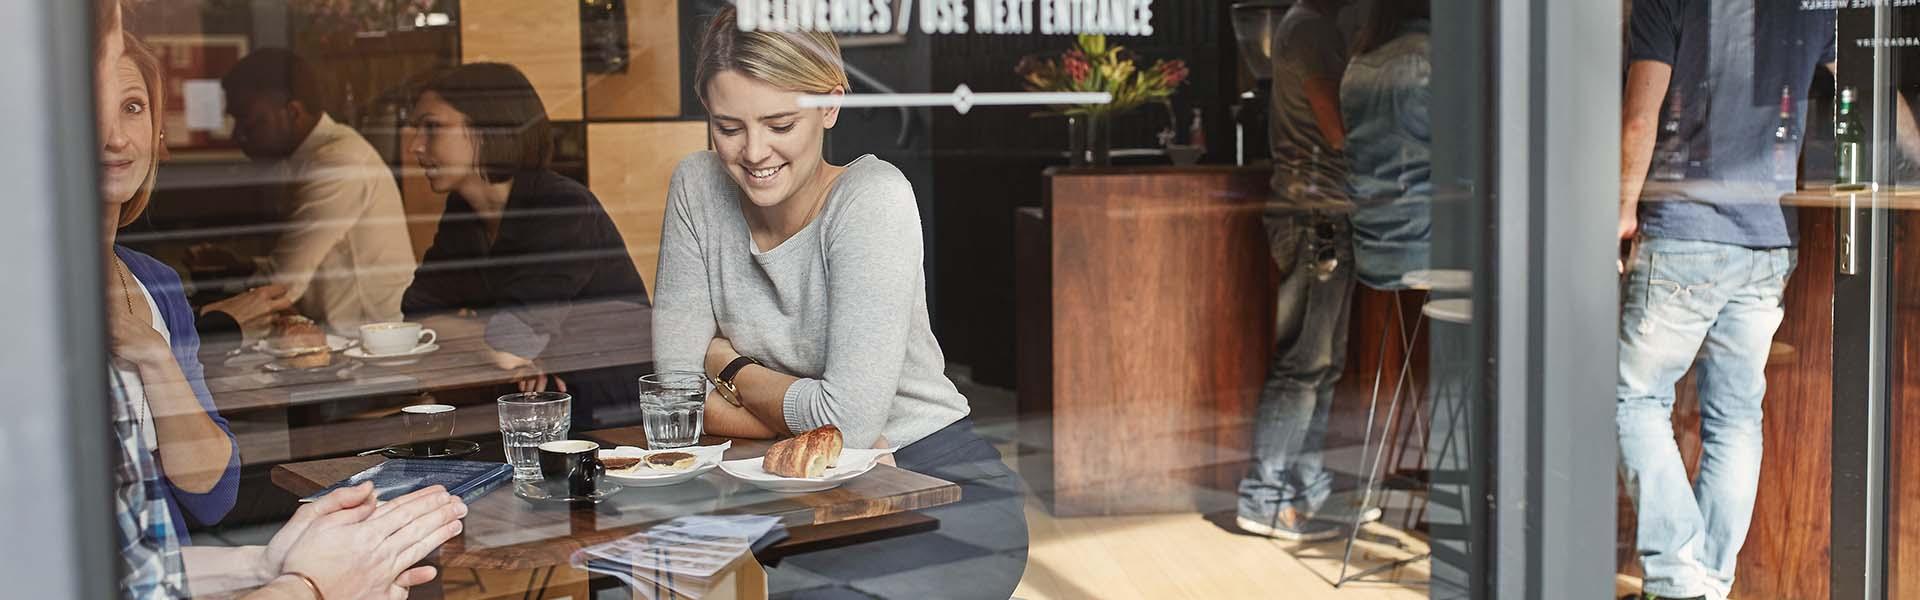 Women enjoying refreshments in a cafe